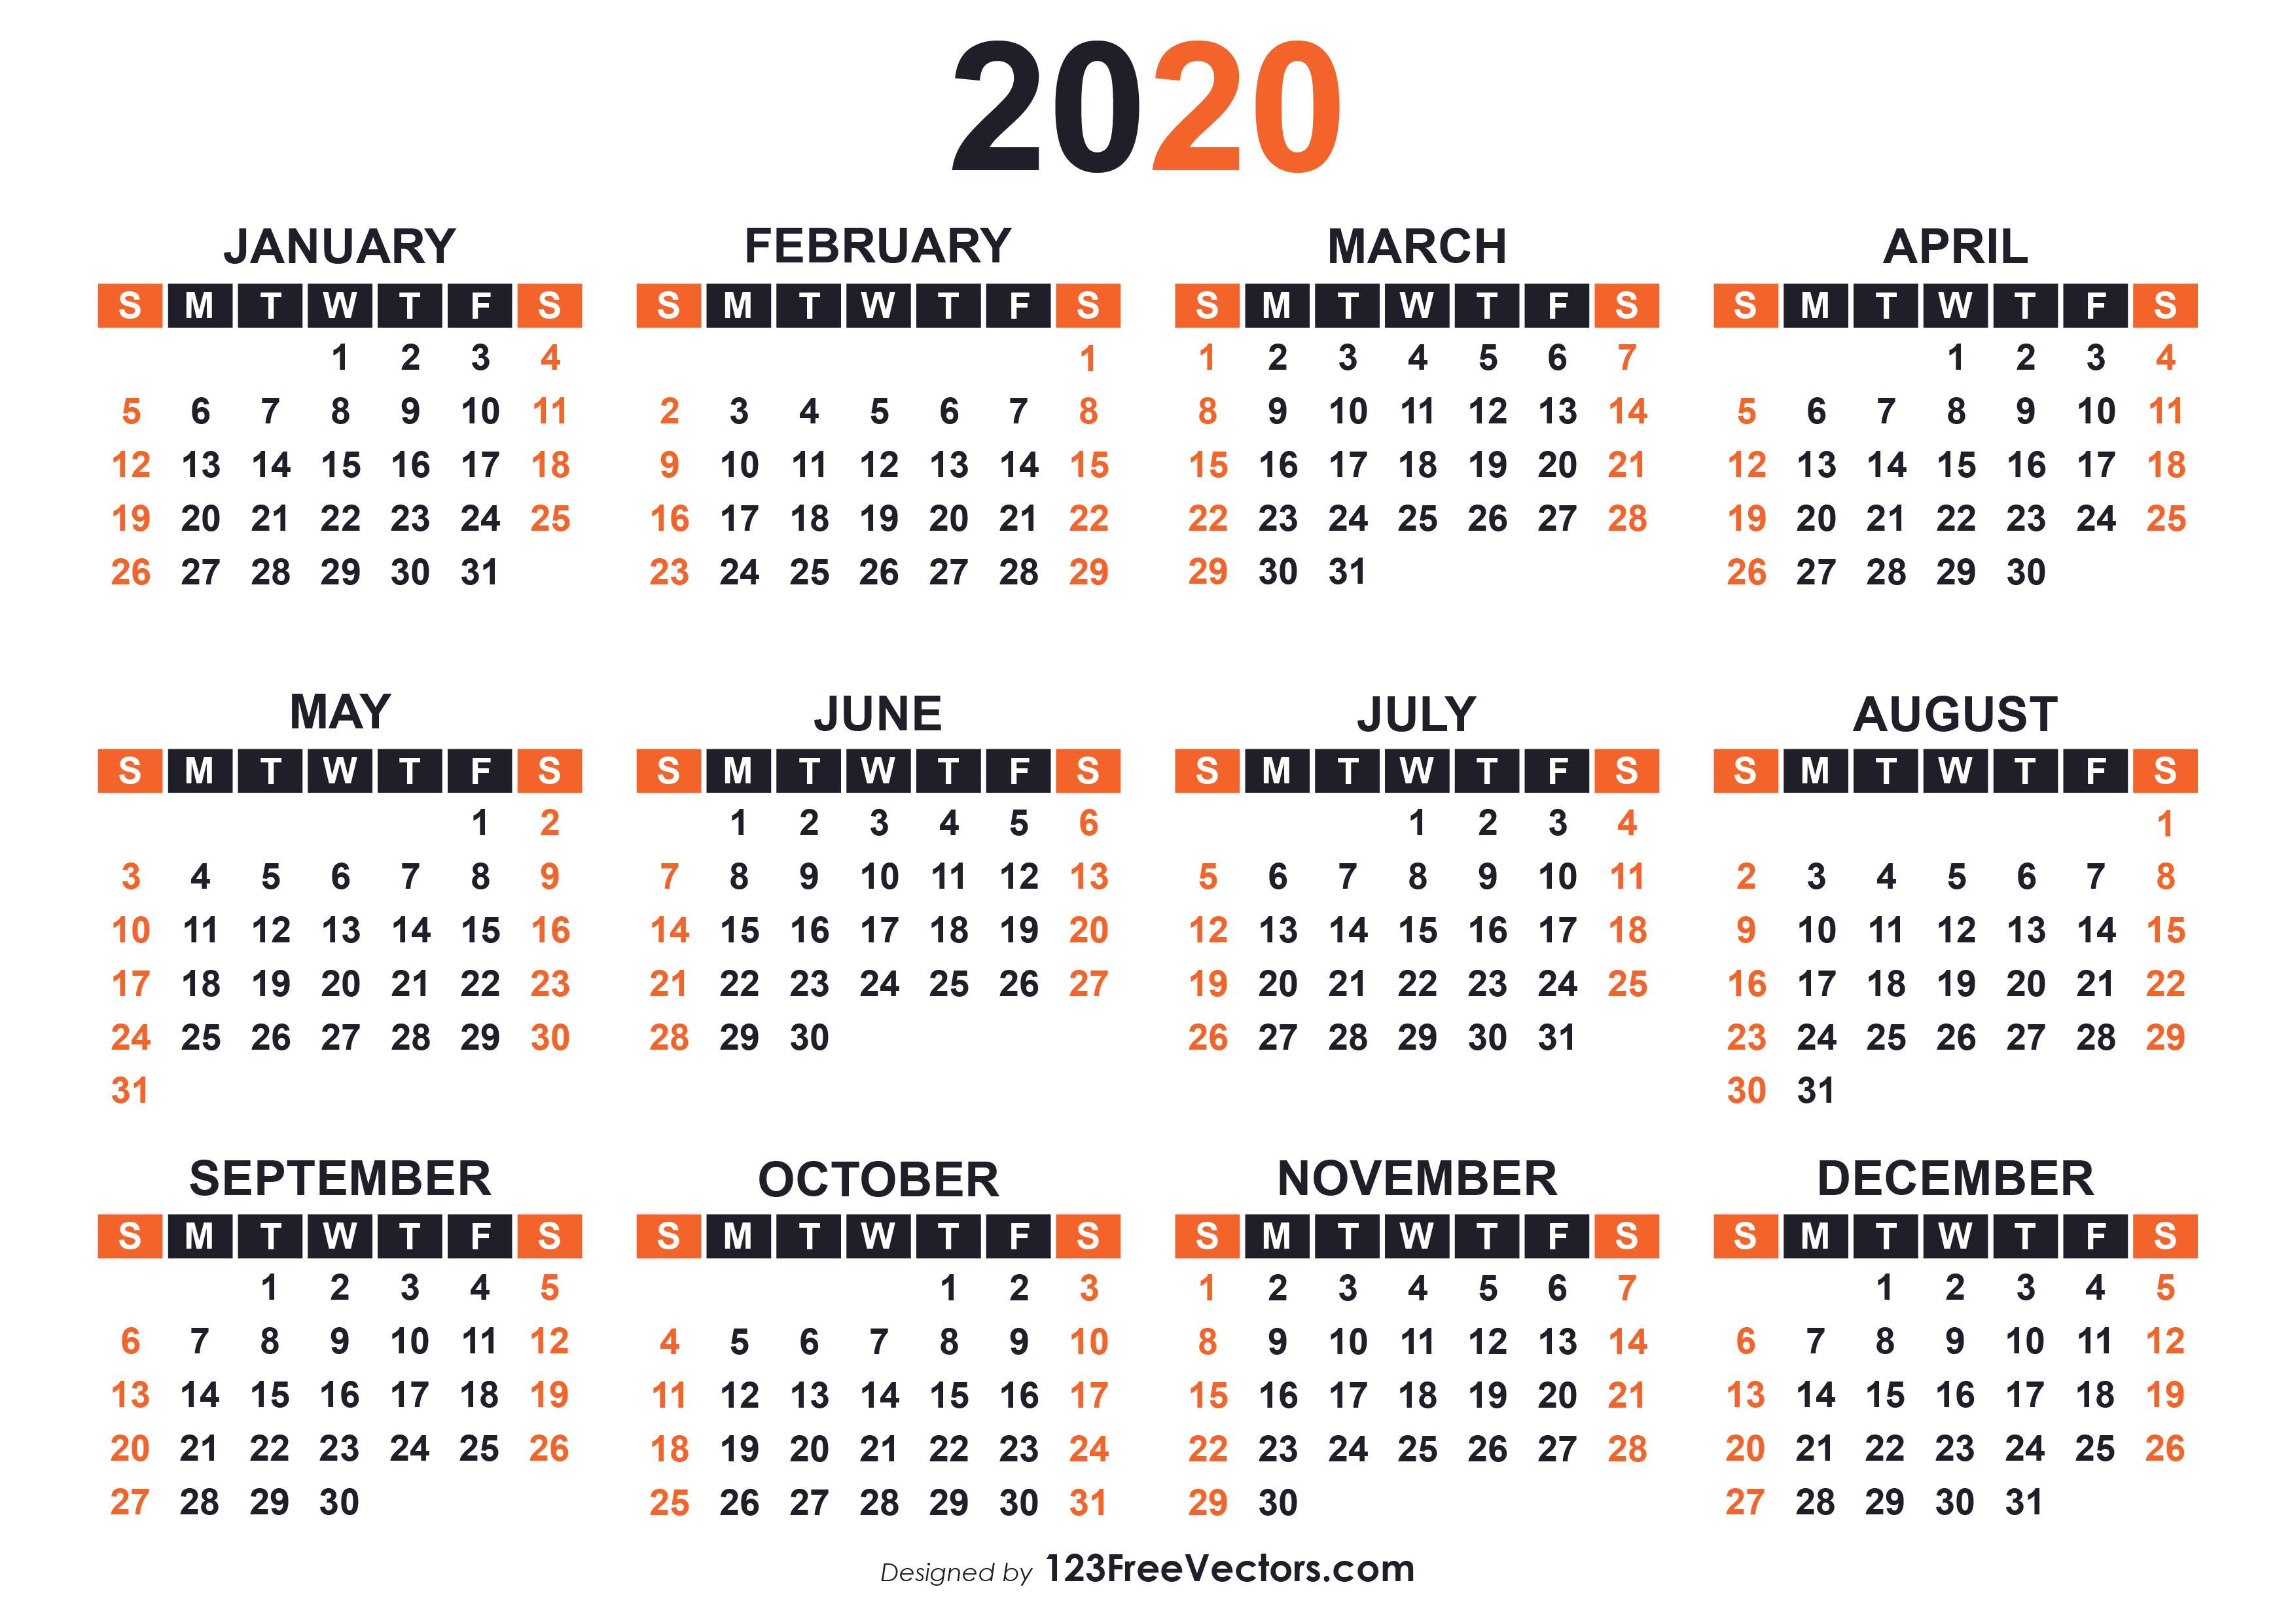 2020 Free Printable Calendar Templates with regard to Free Printable 2020 Calendars Large Numbers